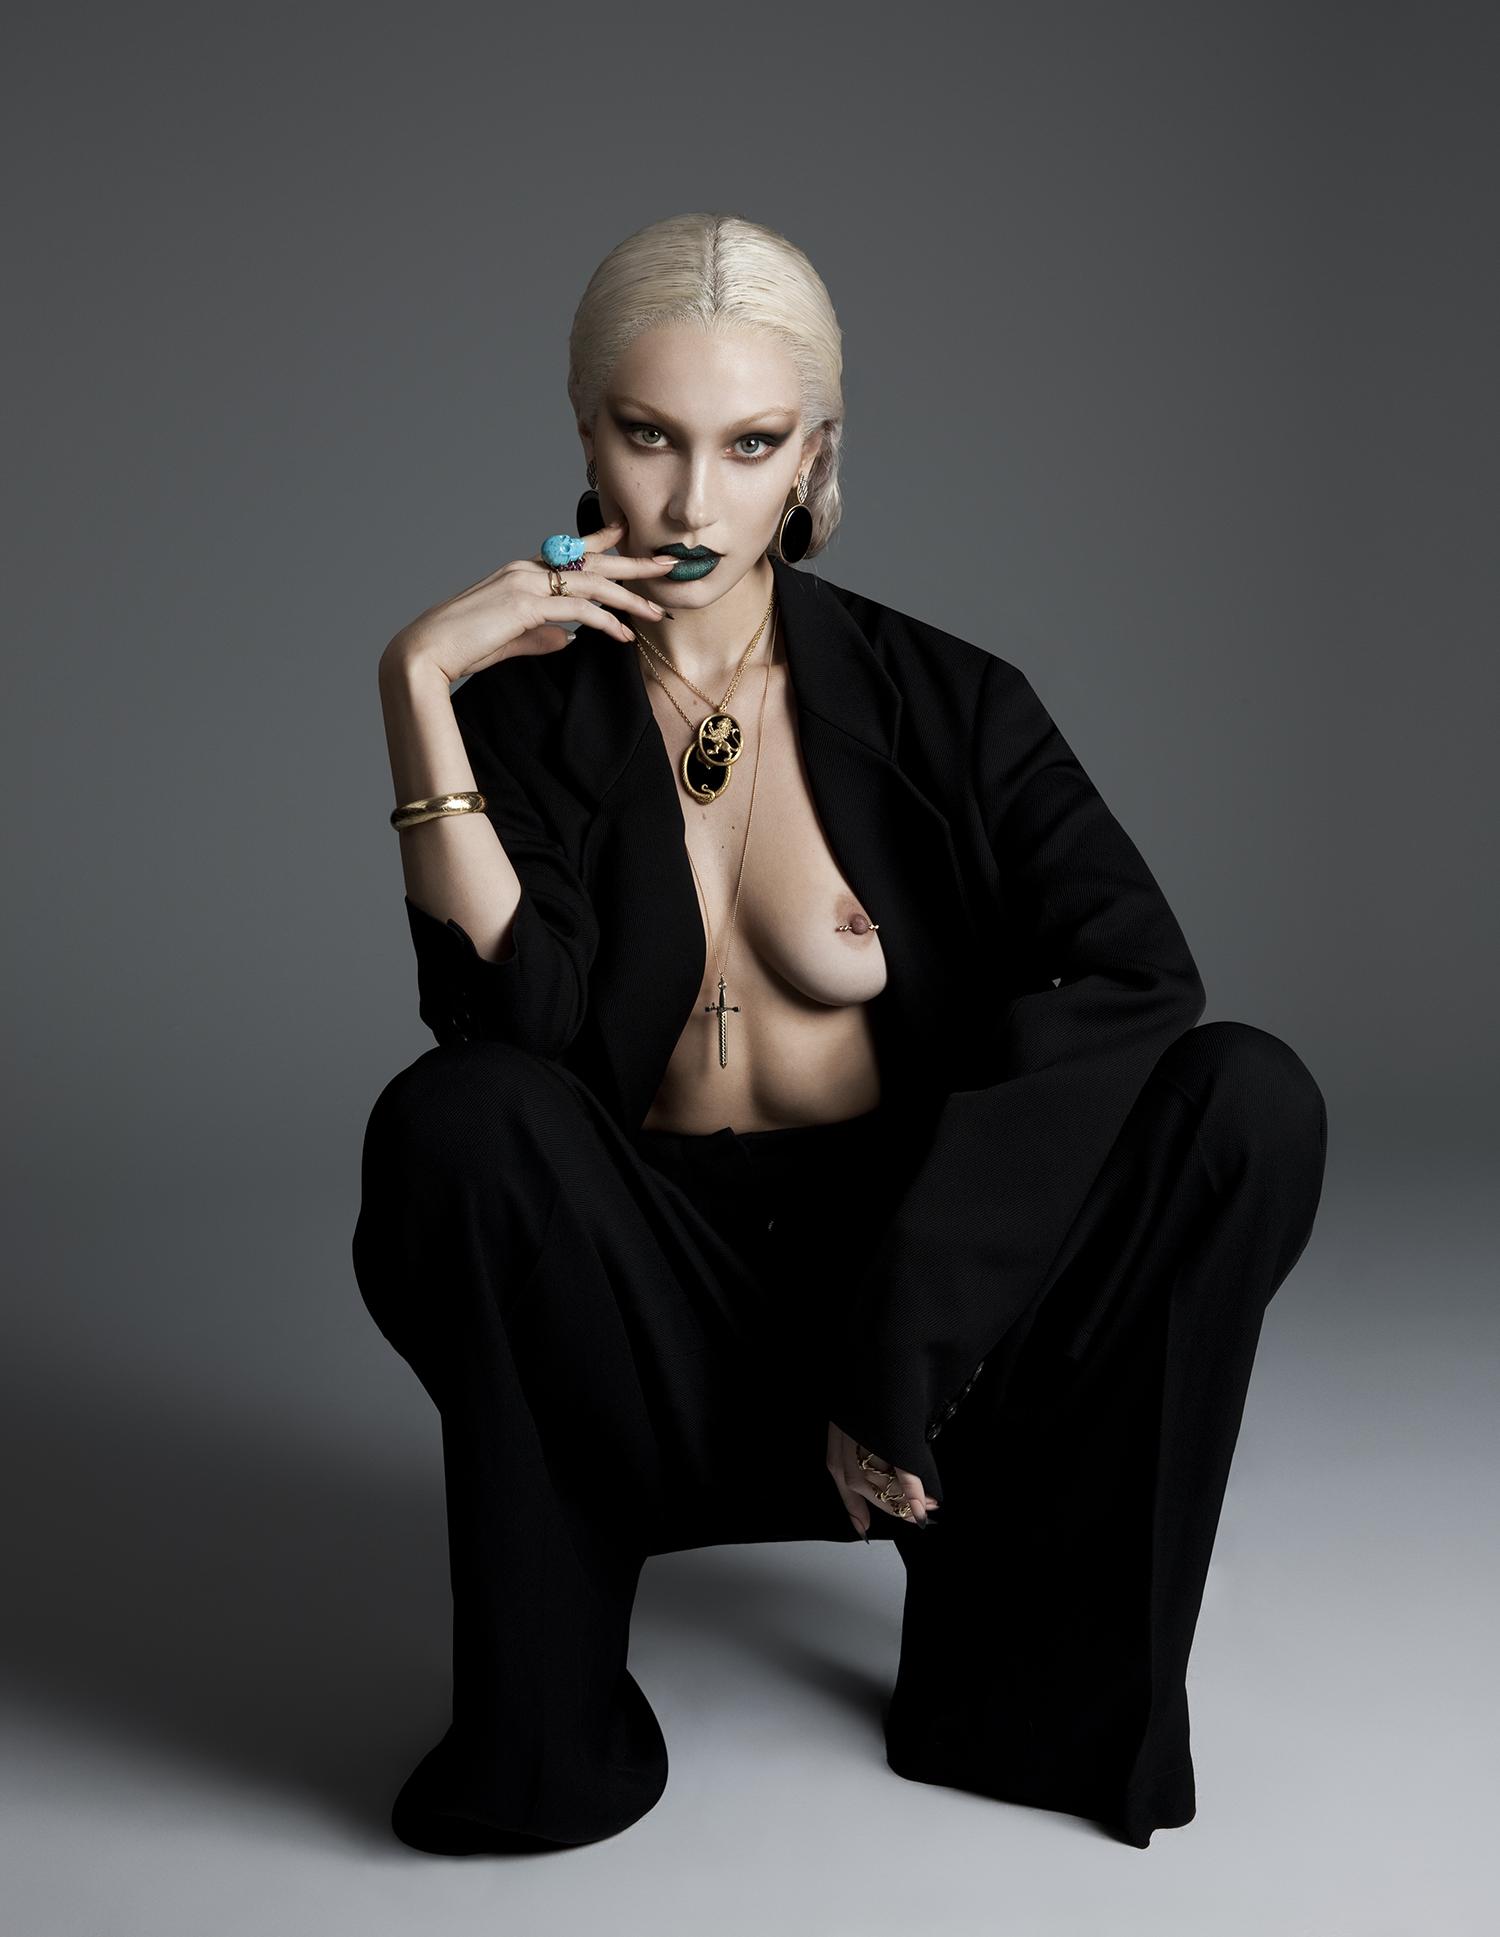 nude (95 photos), Instagram Celebrites pictures